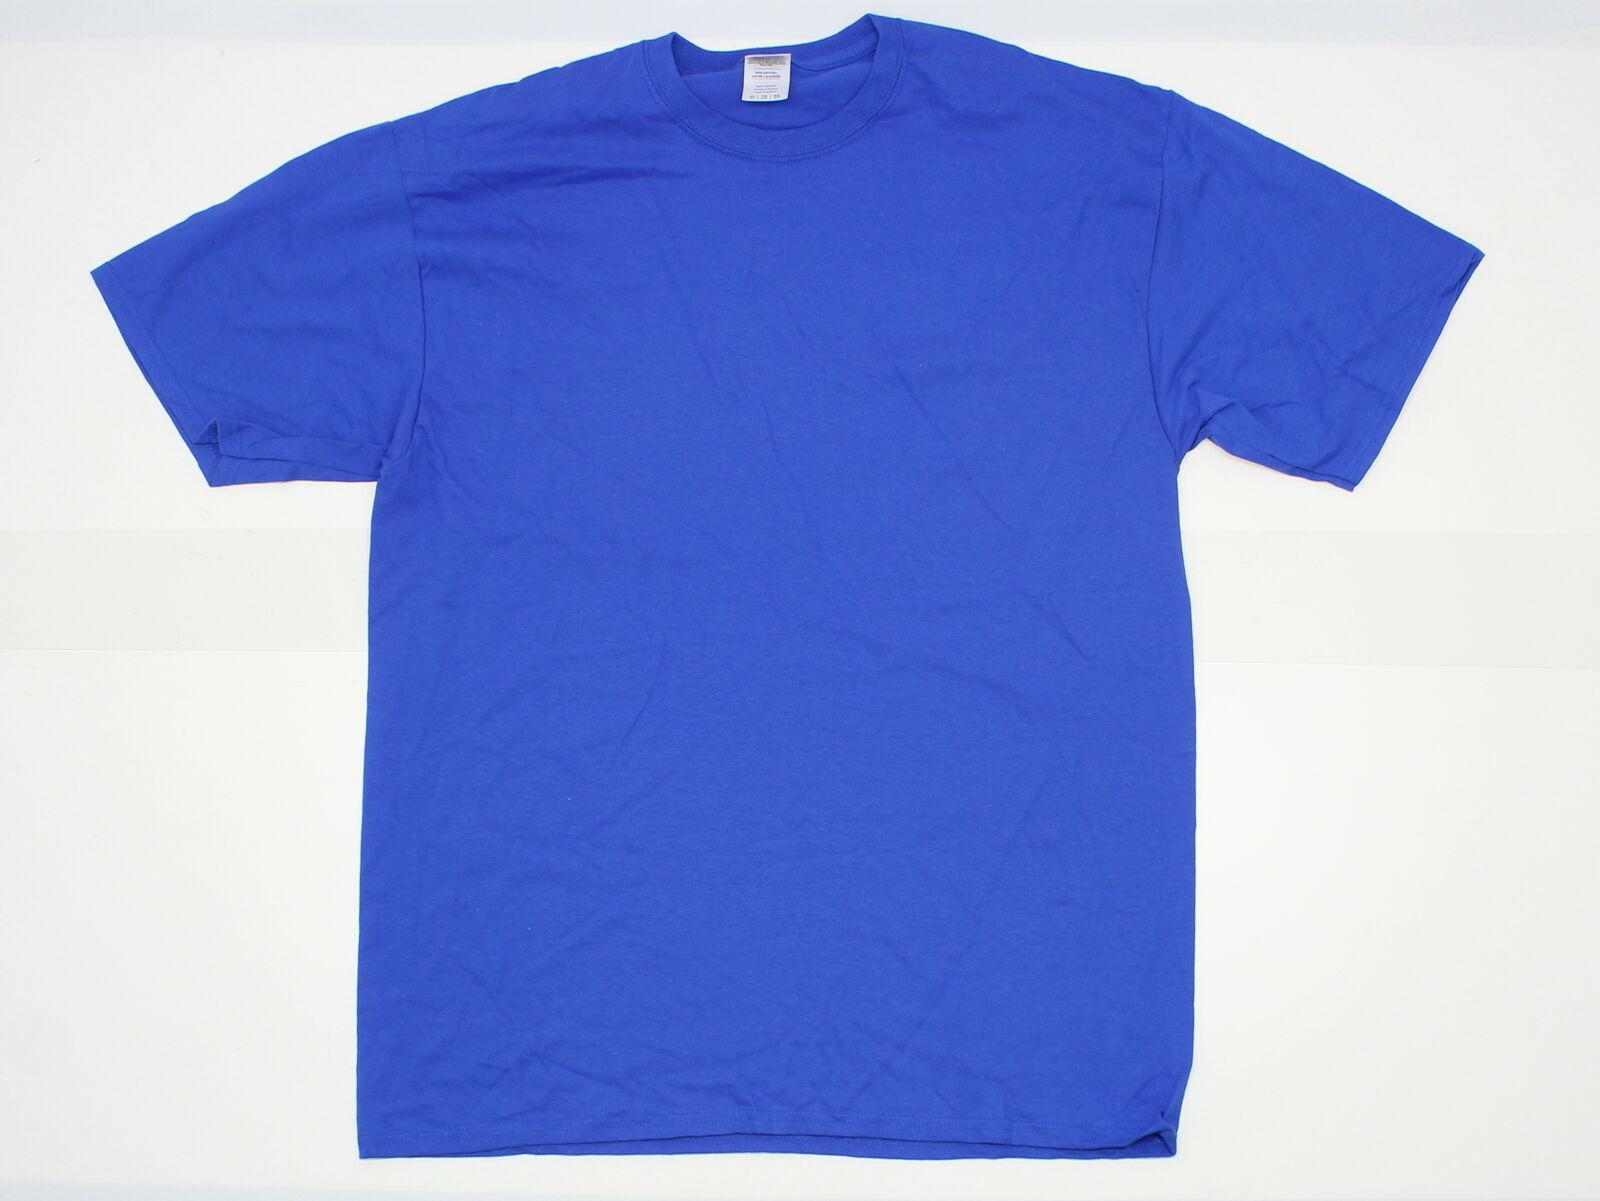 NEW Gildan Ultra Cotton Mens Funny Graphic Tee T-Shirt Black Large 02770